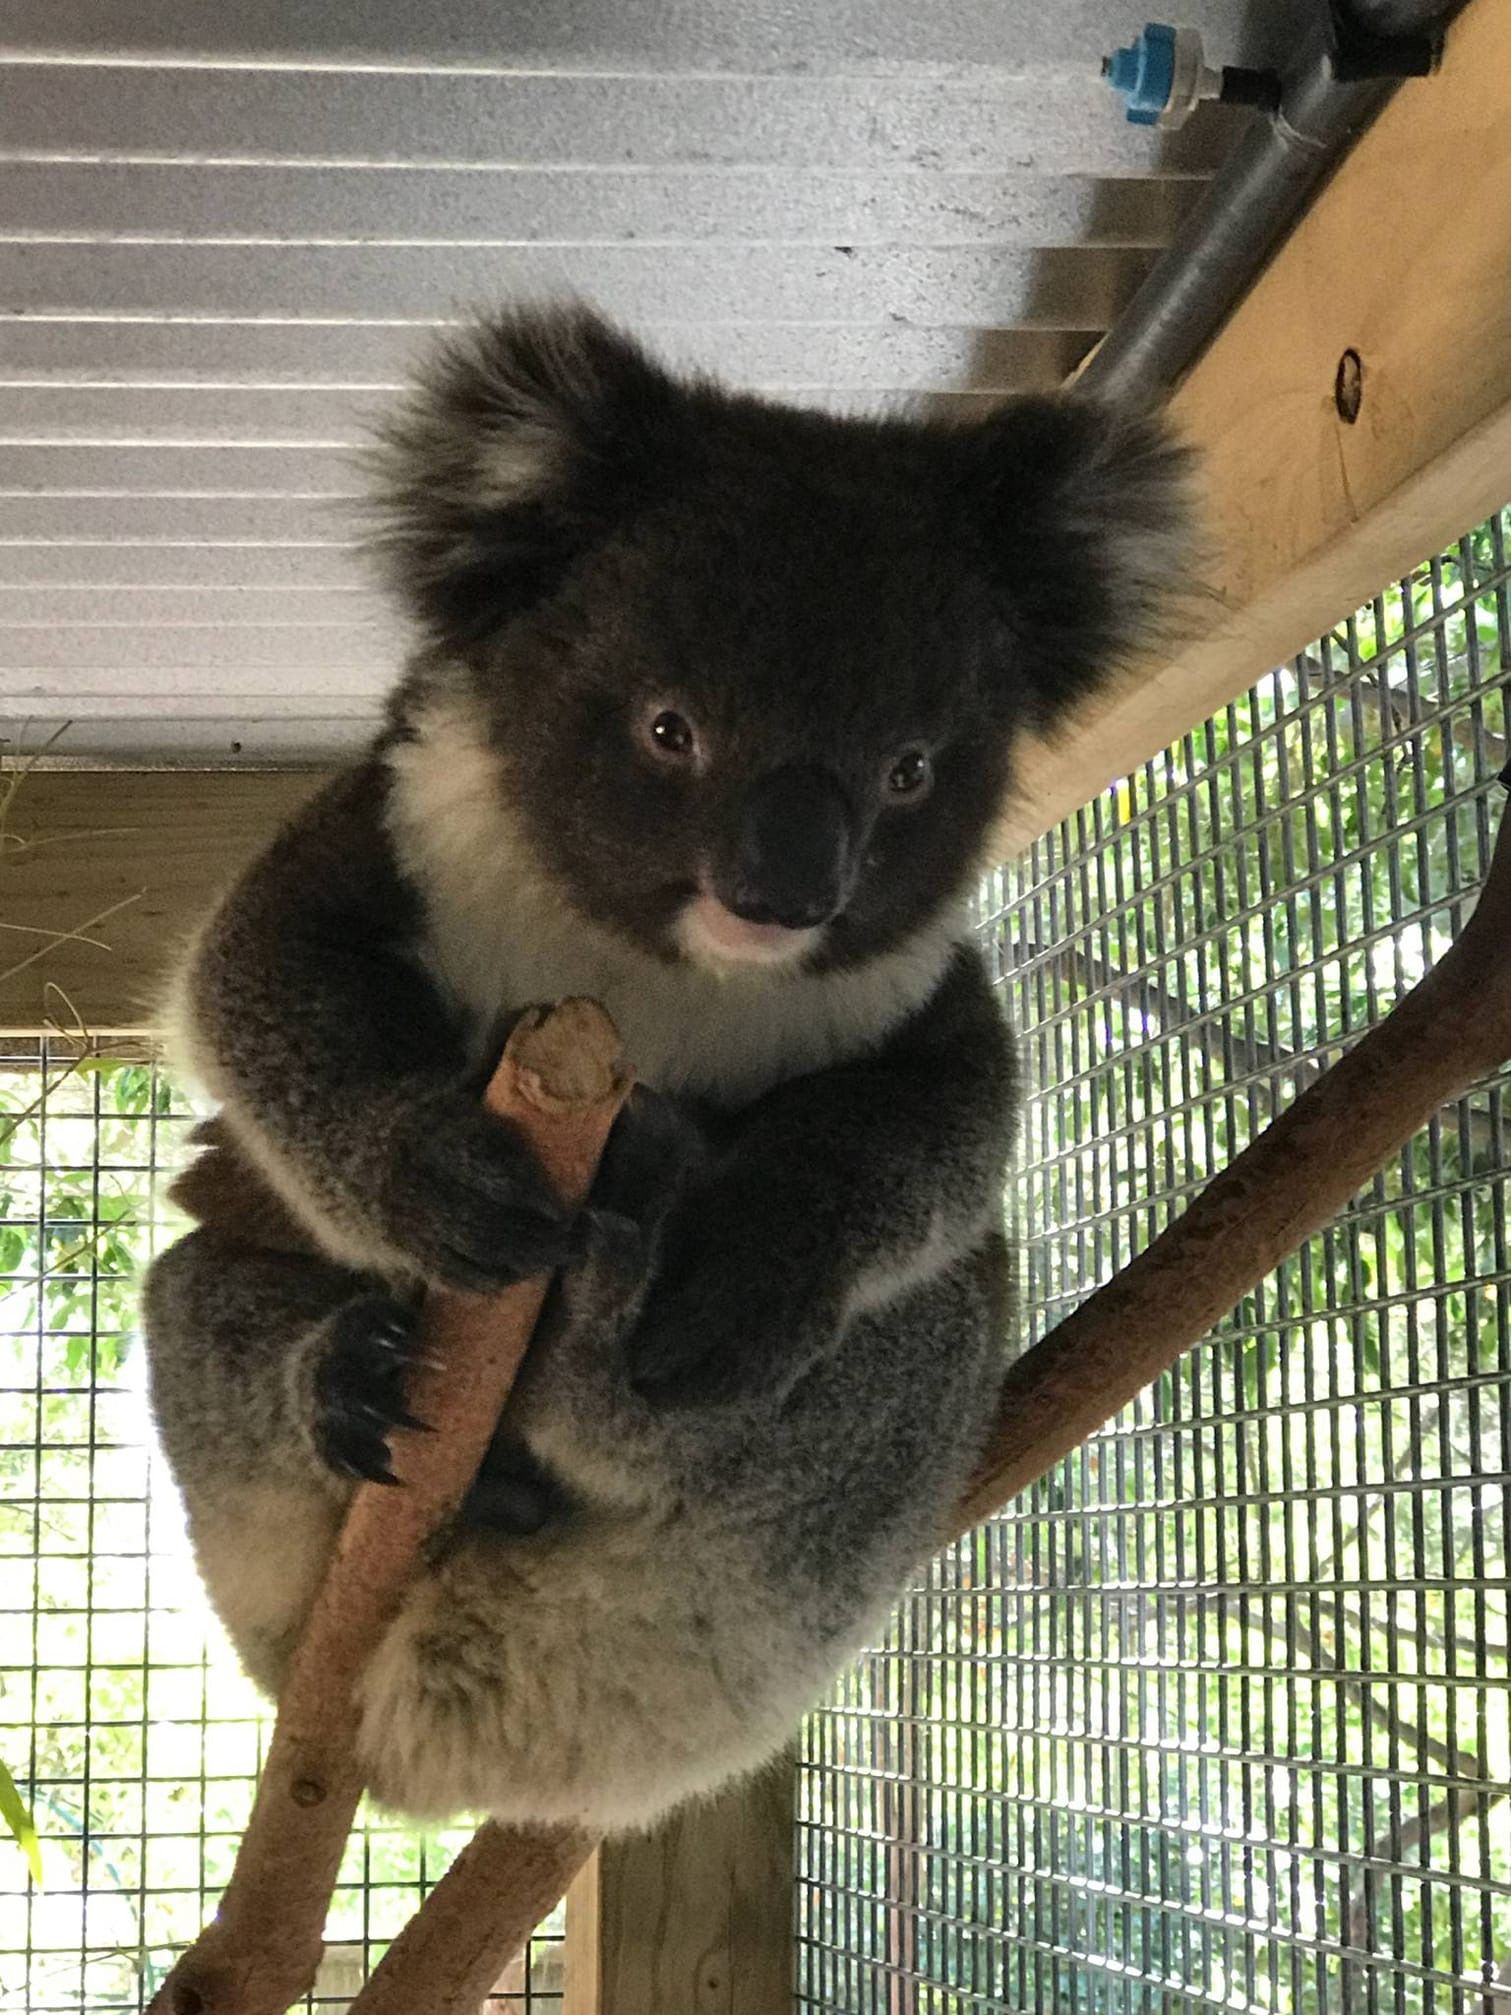 Pin Von Kimberly Parson Auf Koalas Tiere